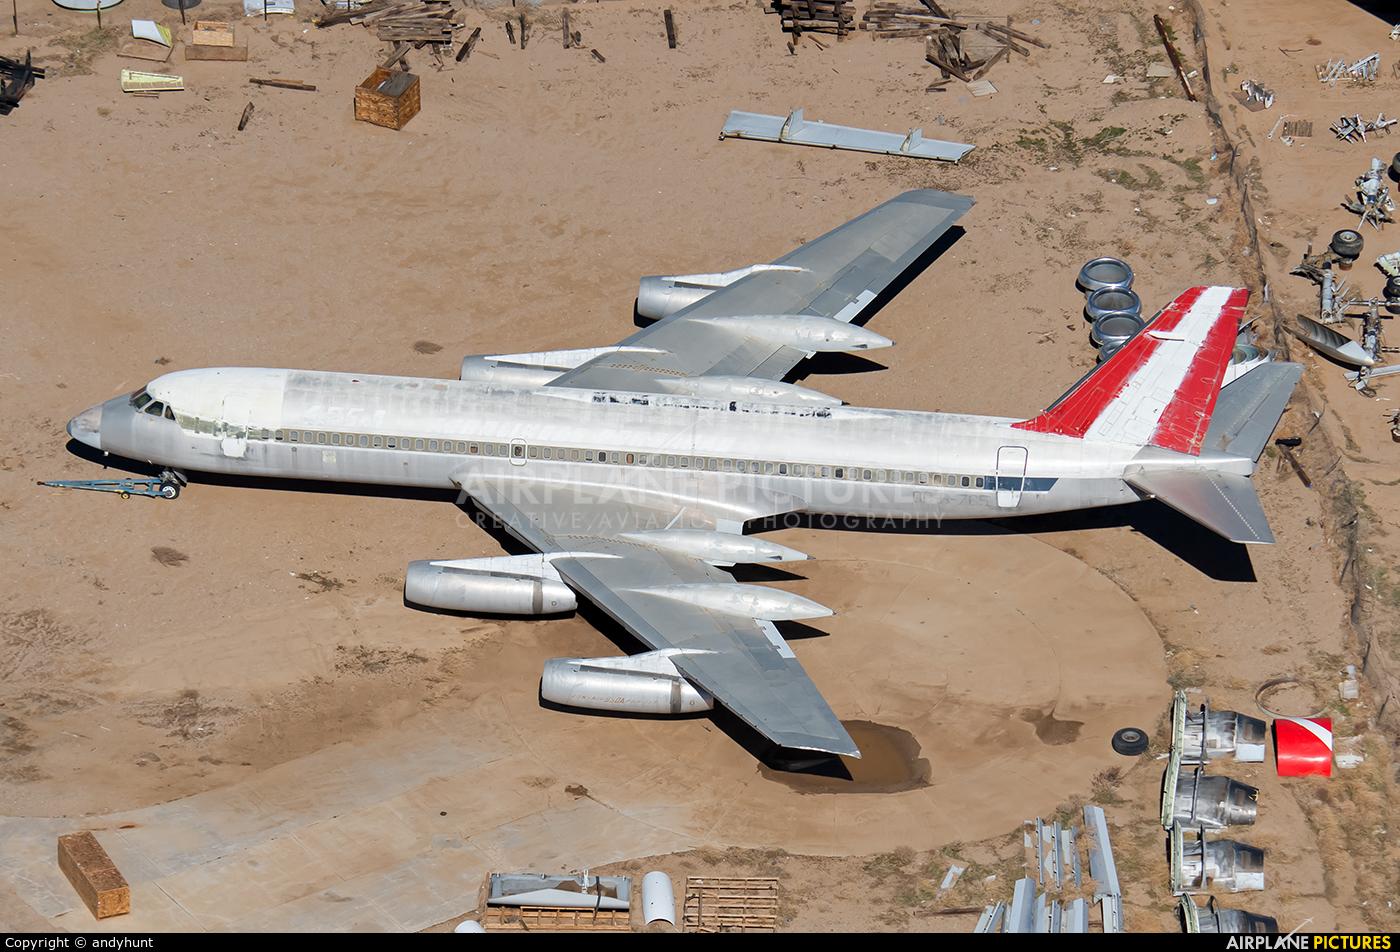 APSA - Aerolineas Peruanas OB-R-765 aircraft at Mojave